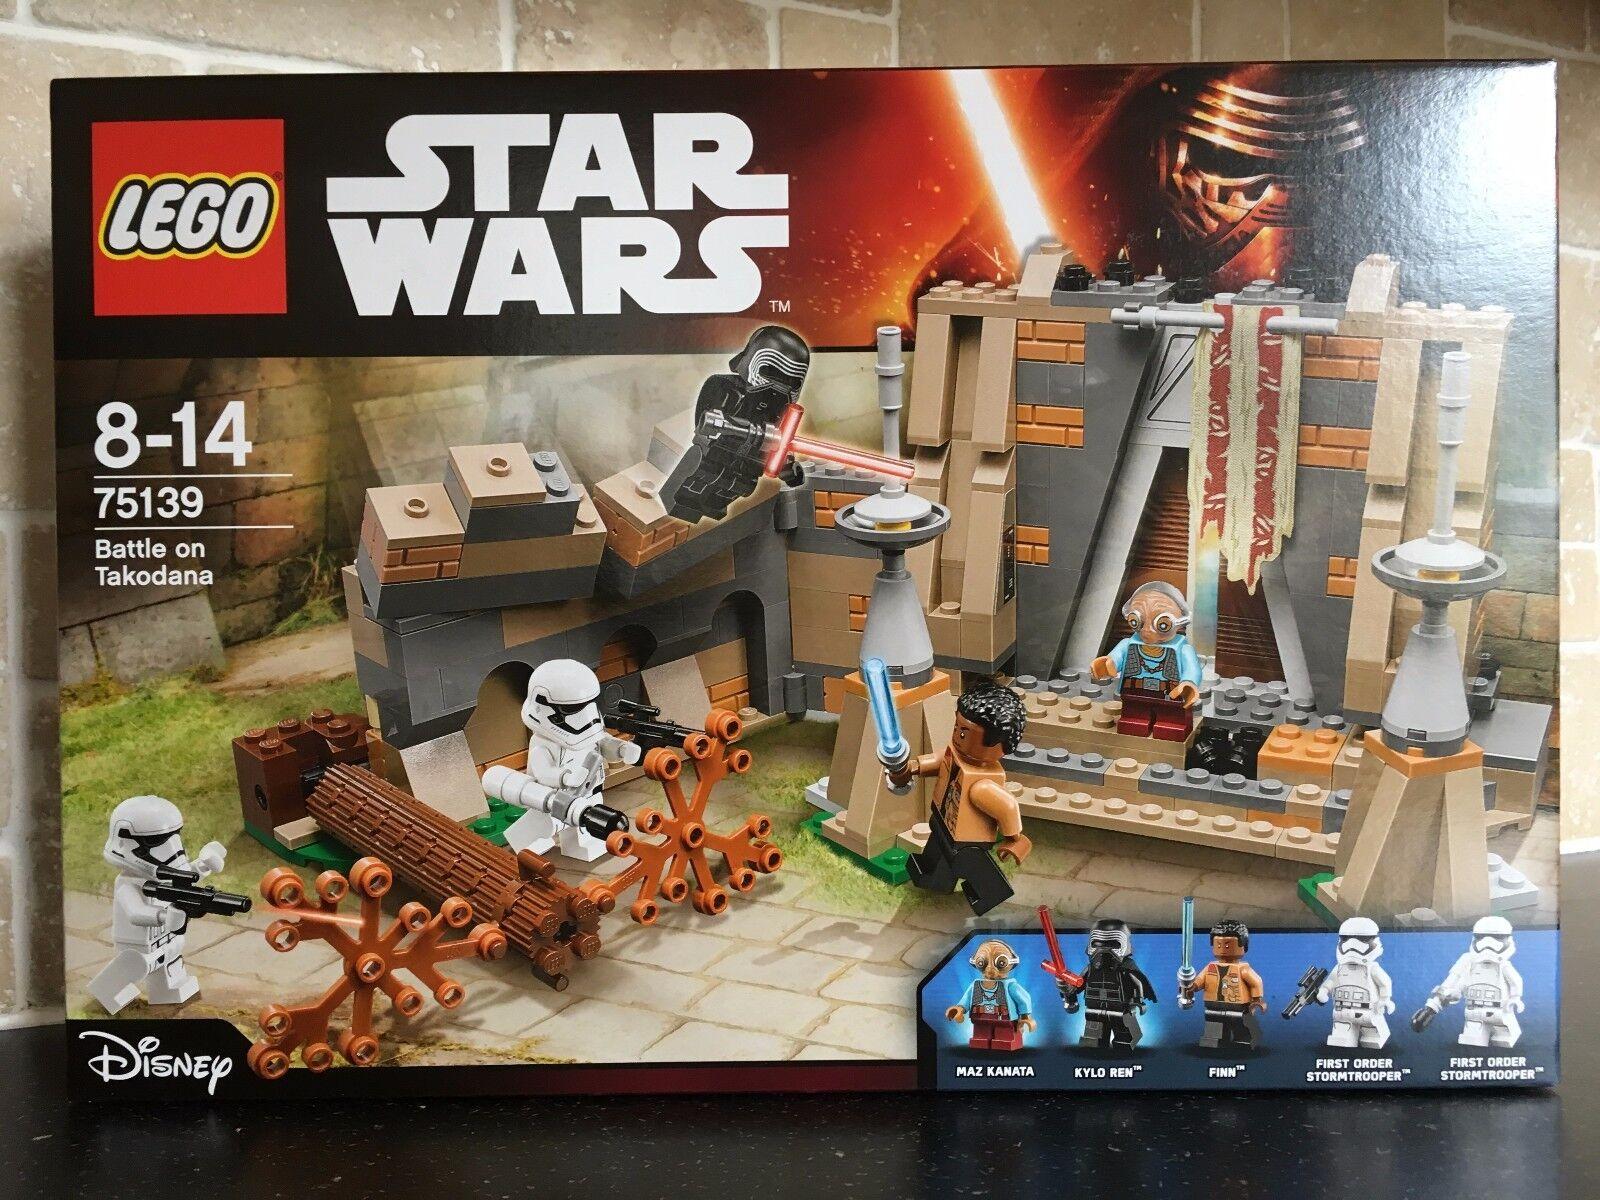 LEGO STAR WARS - 75139 Battle On Takodana Brand New In Sealed Box